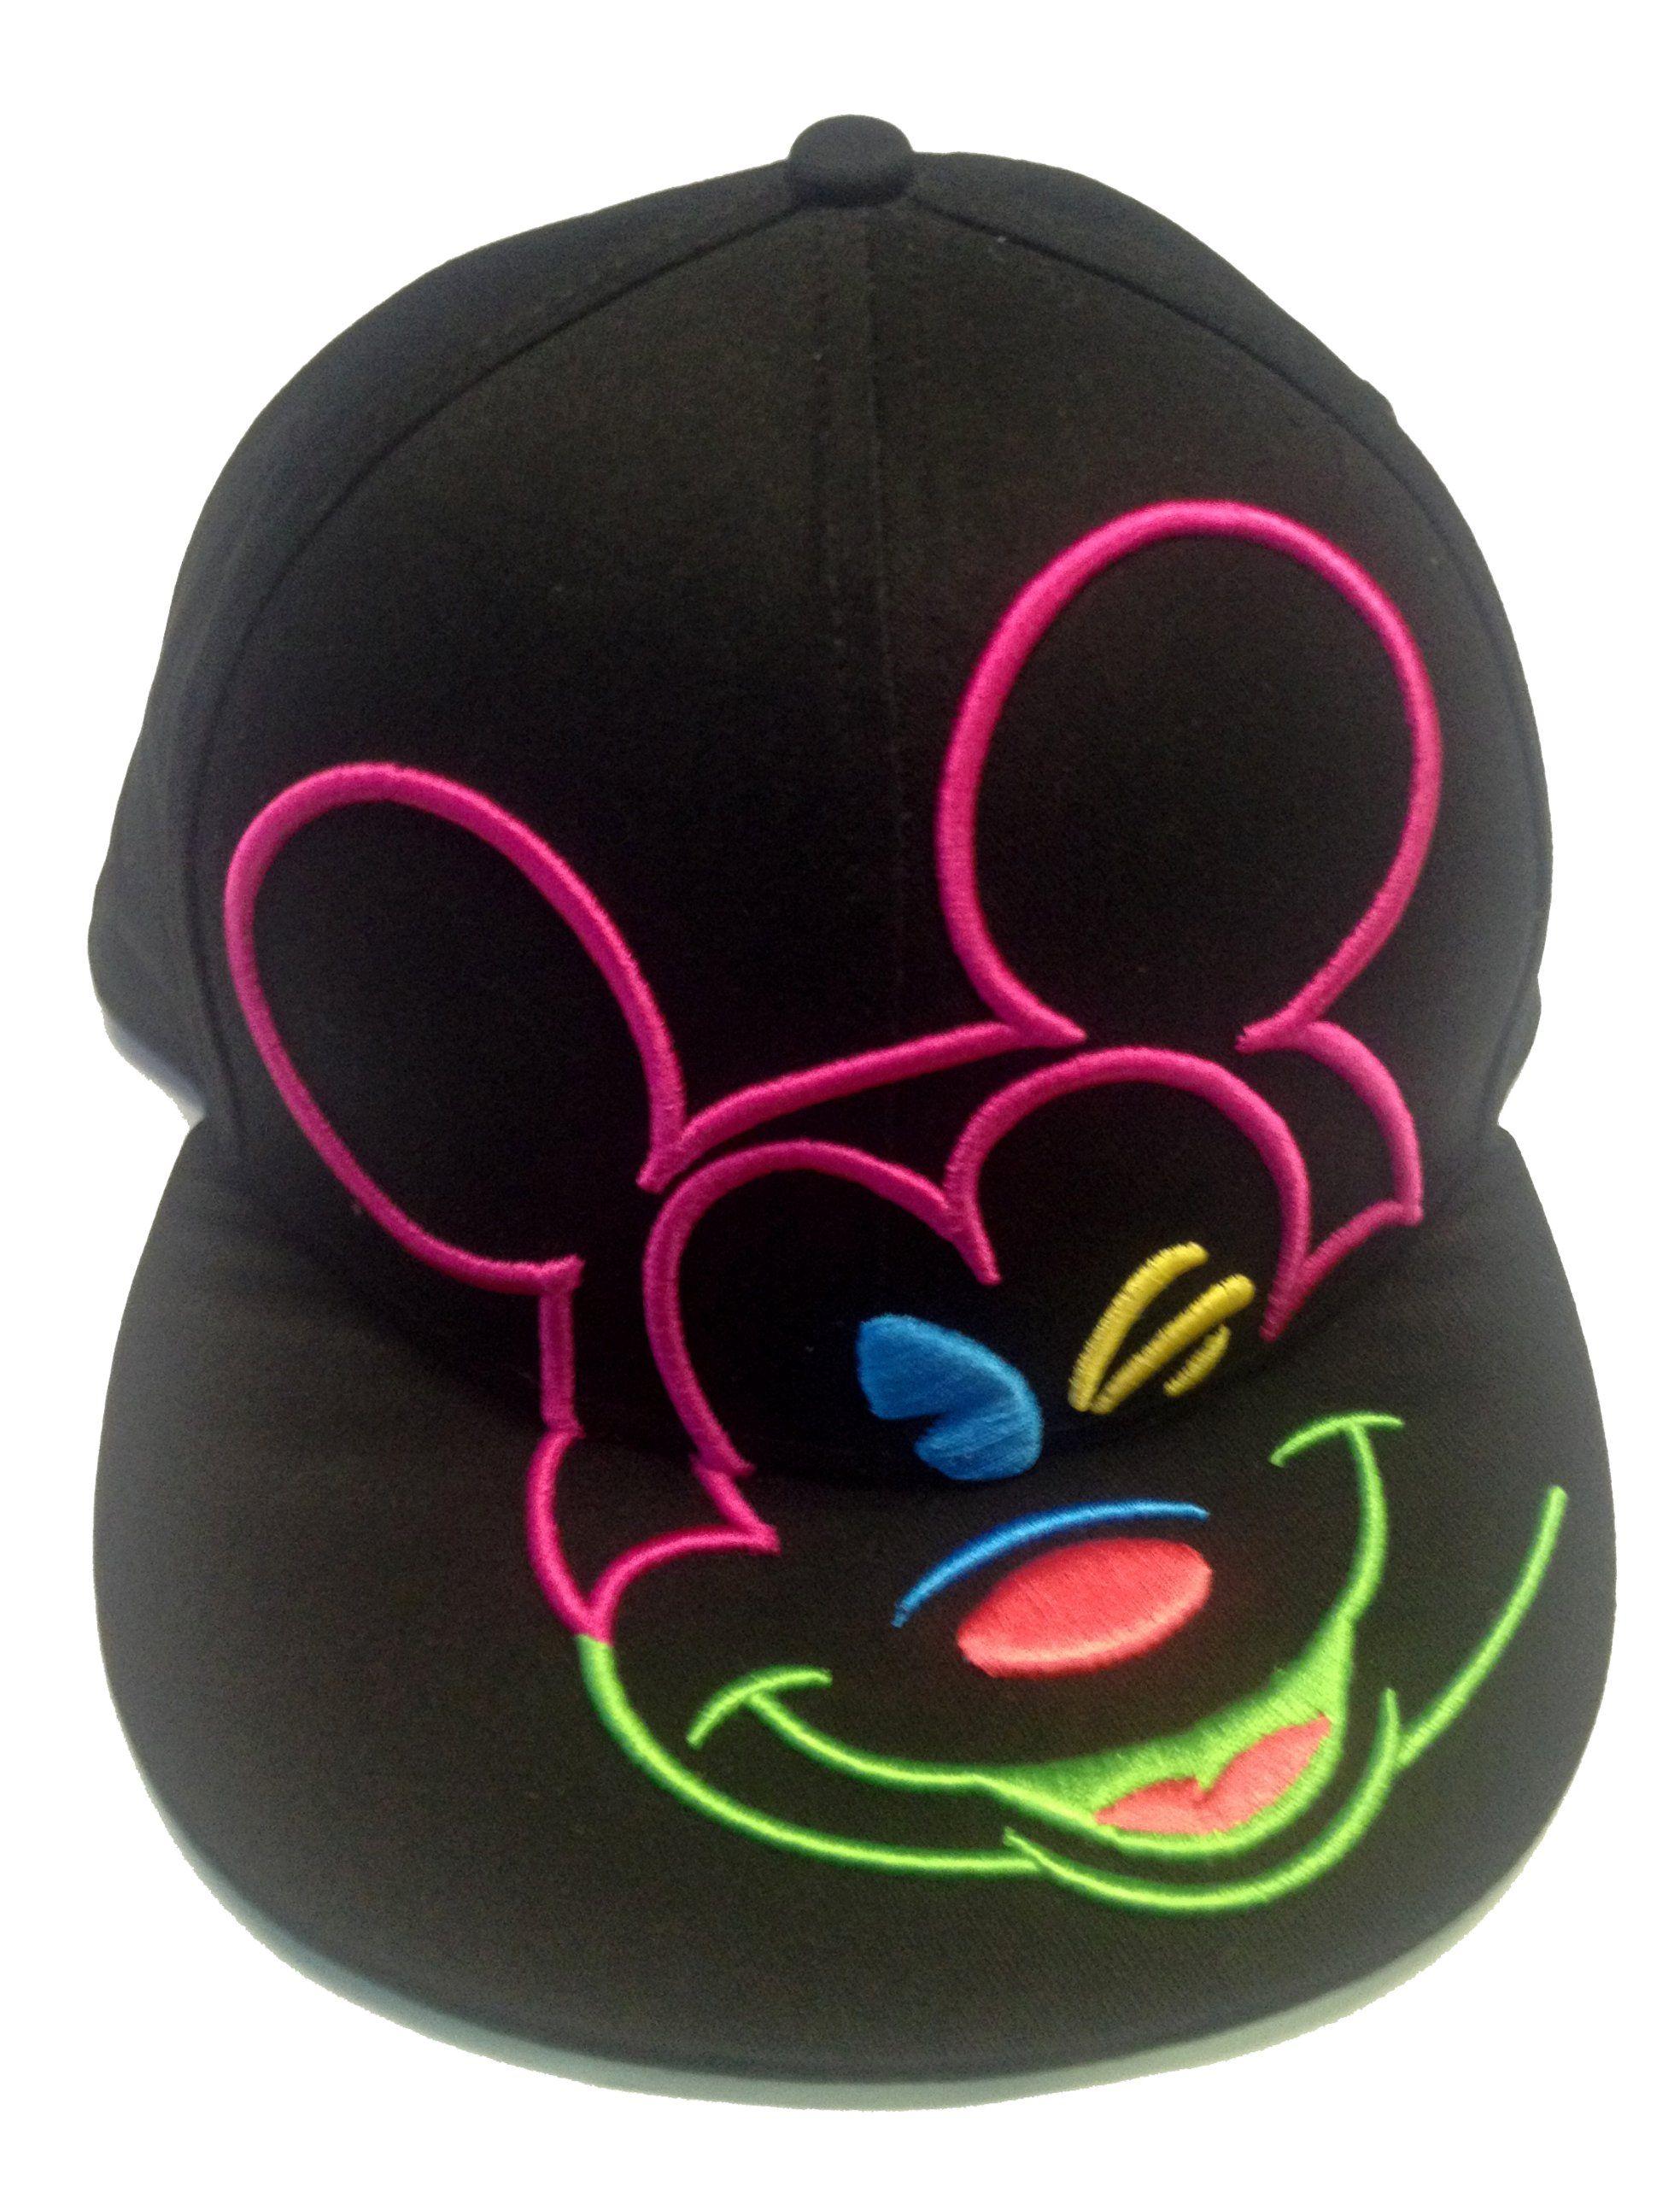 041fec8e2 Disney Mickey Mouse Black Neon Colors Outlined Snapback Hat Cap Flat ...